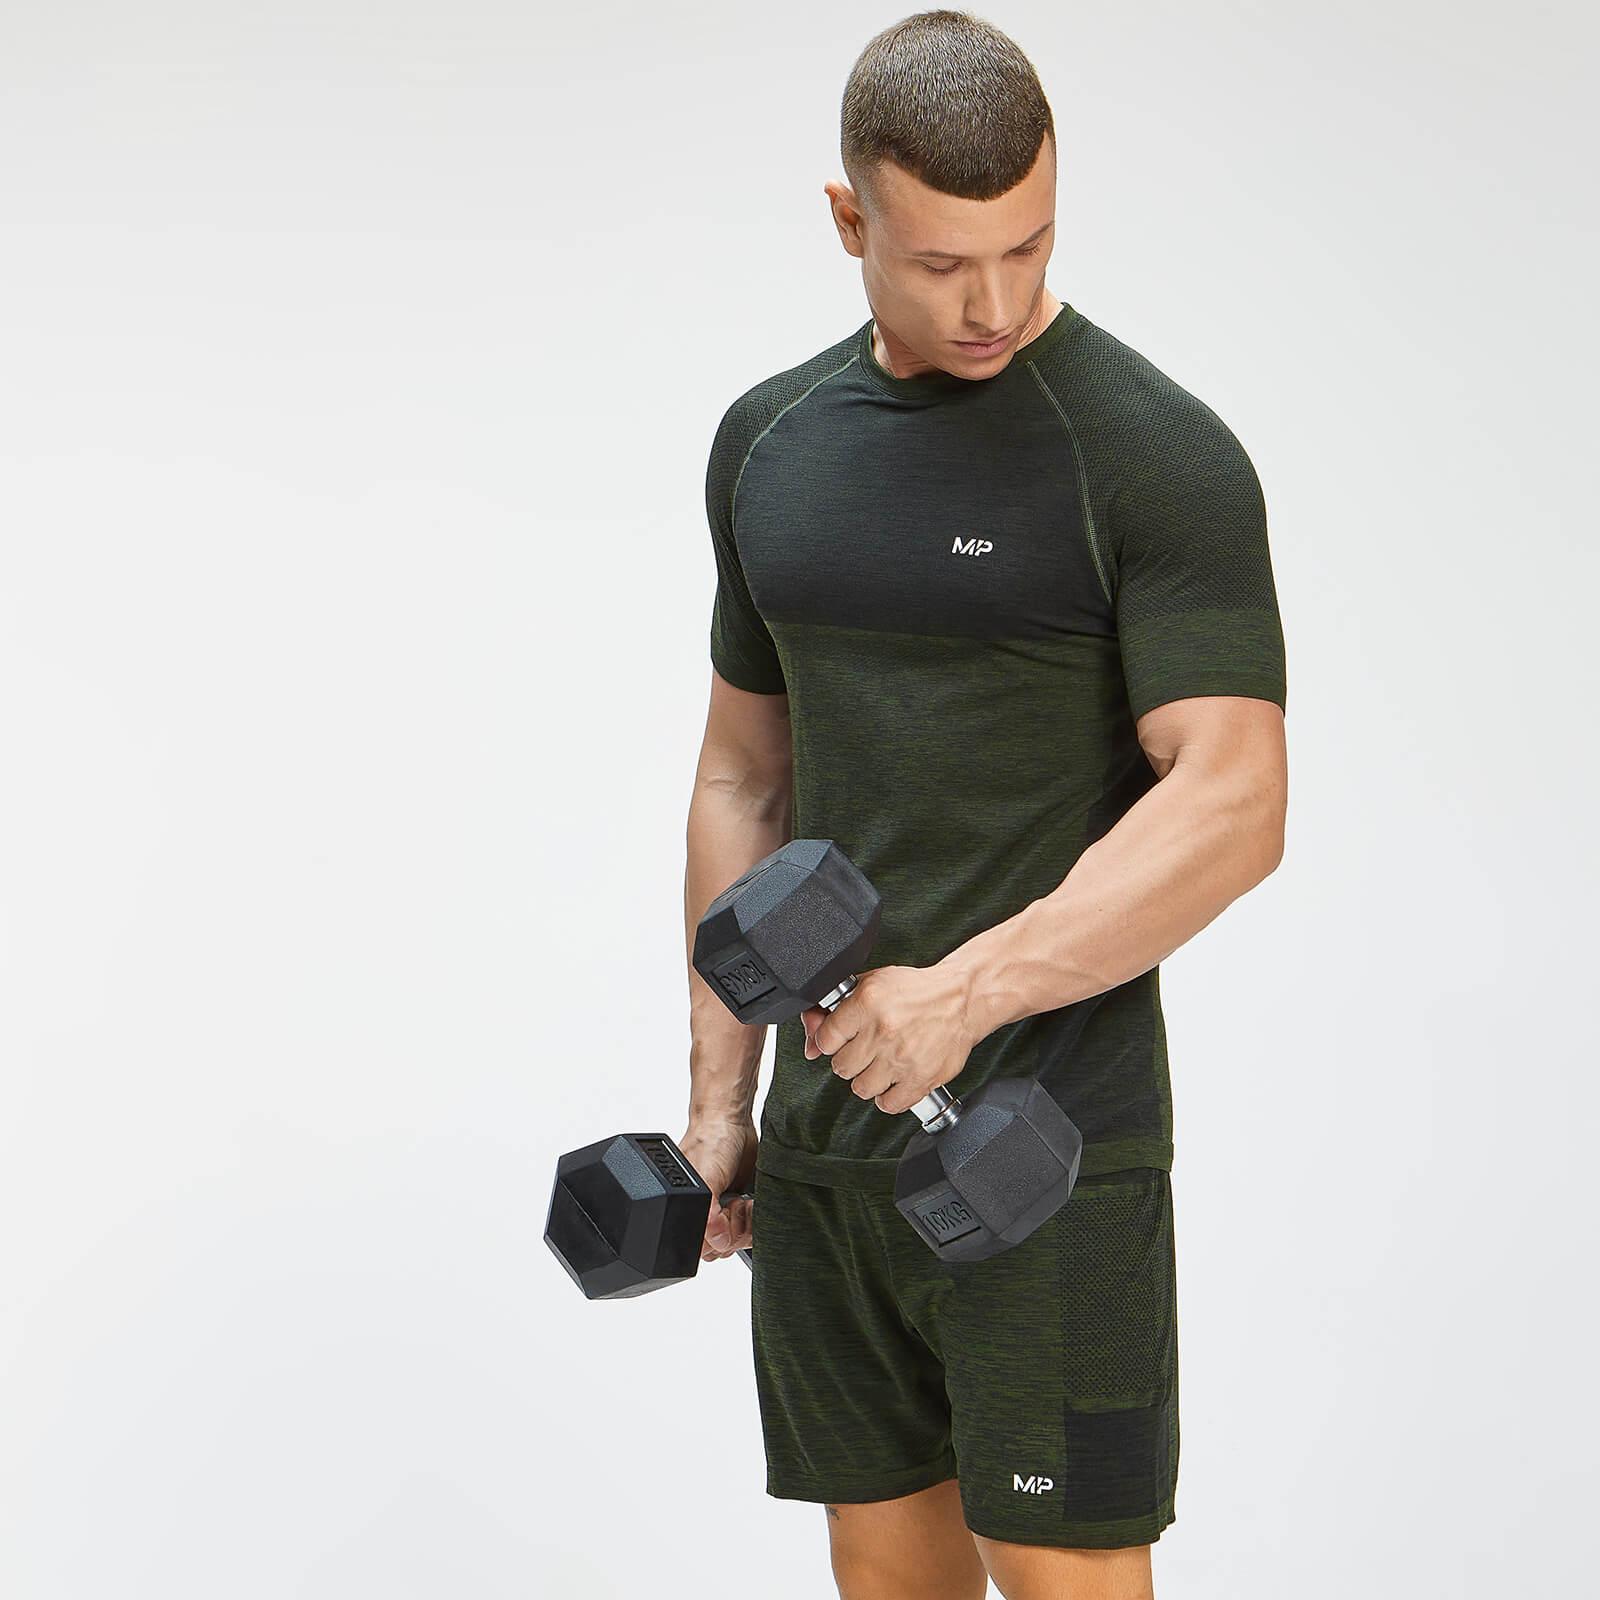 MP Men's Essential Seamless Short Sleeve T-Shirt - Vine Leaf Marl - L, Myprotein International  - купить со скидкой